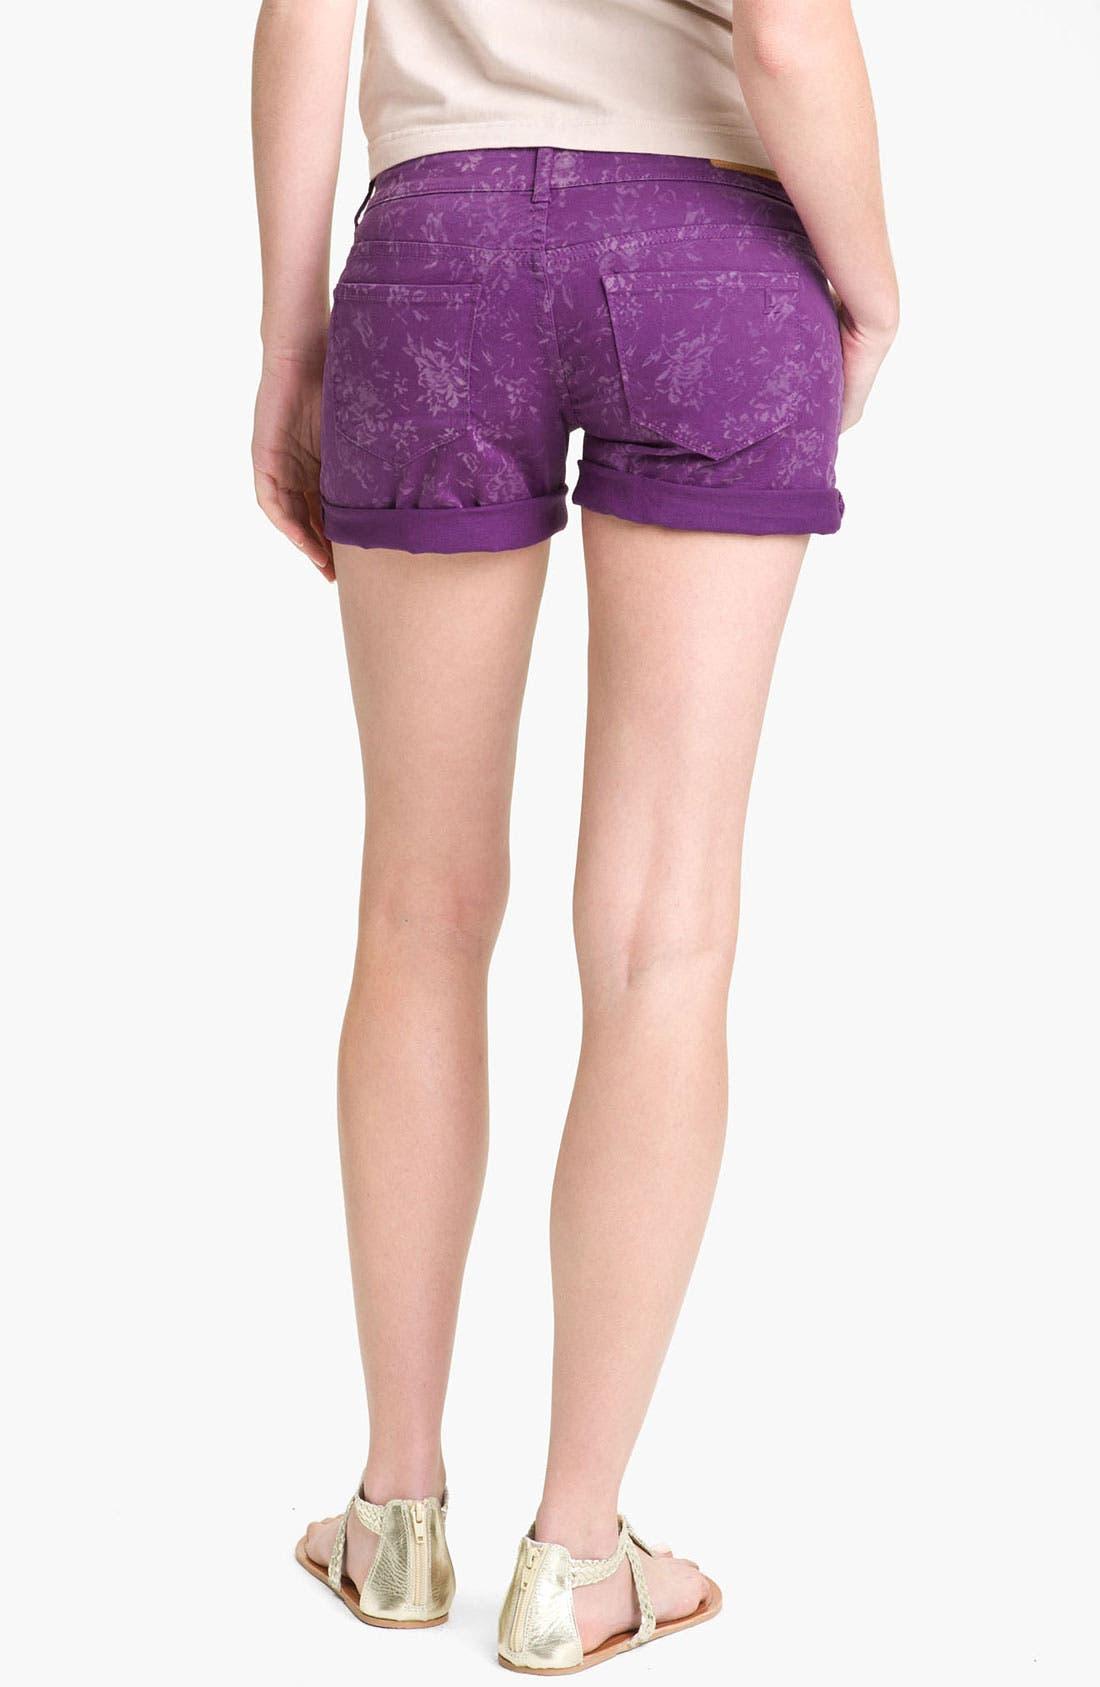 Alternate Image 1 Selected - Articles of Society 'Kara' Cuff Denim Shorts (Flower) (Juniors)